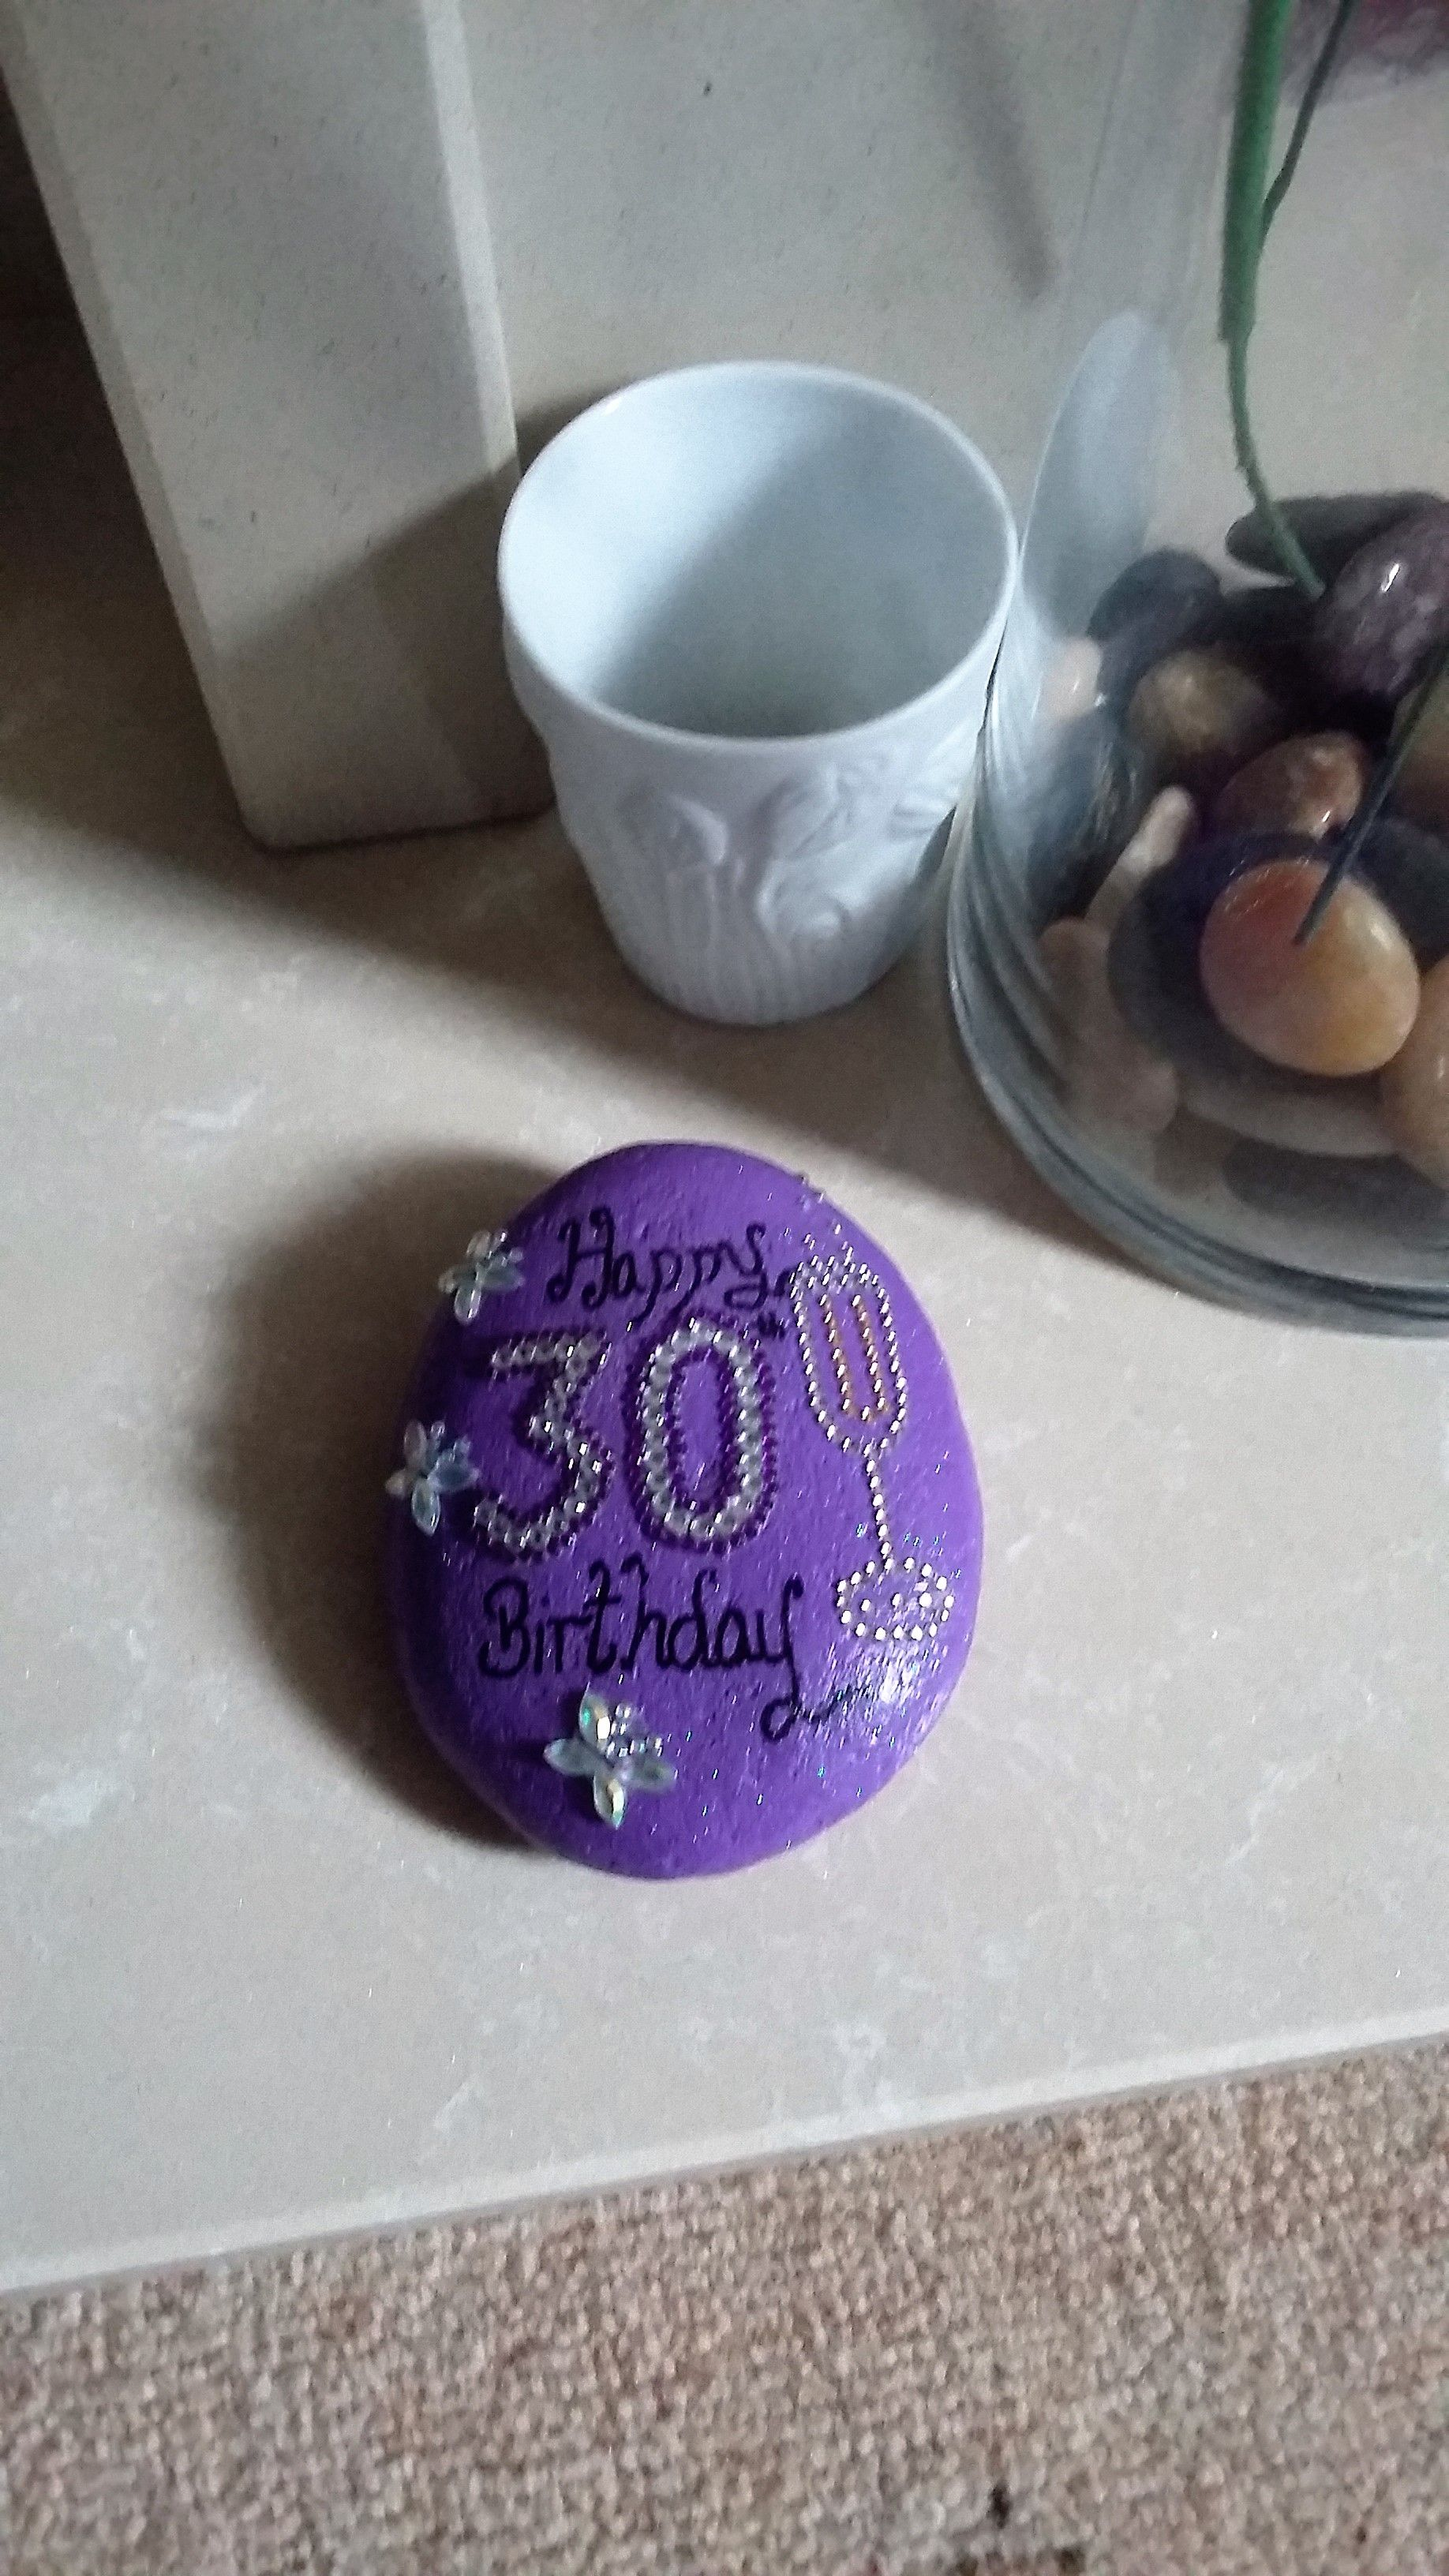 30th Birthday Celebration Stone Gifts Keepsake Click Here For